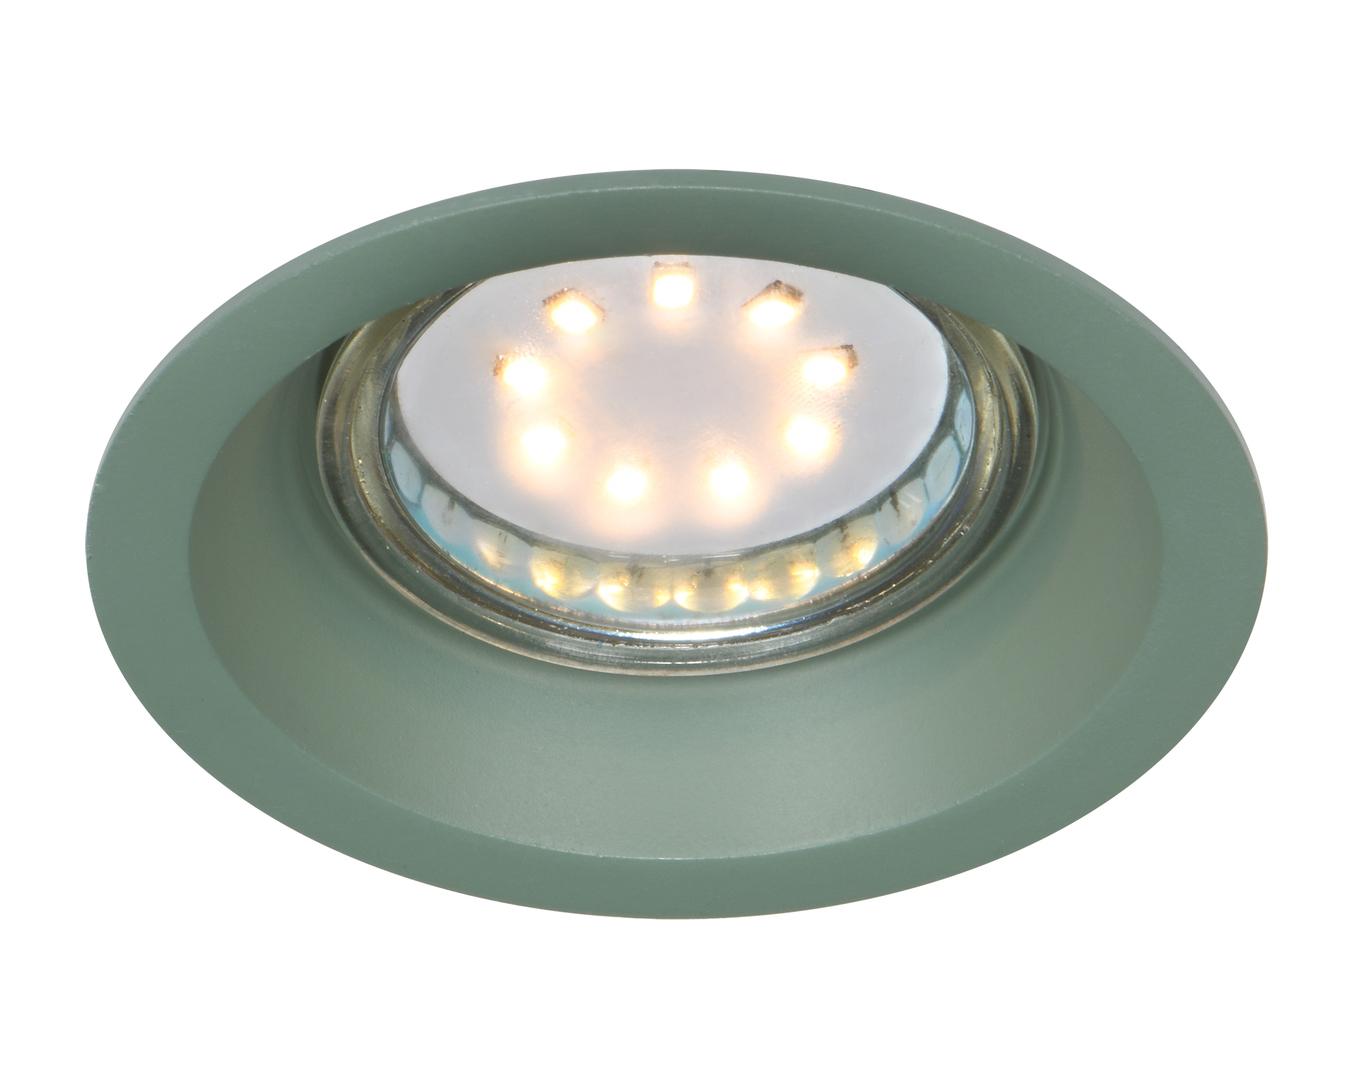 Sa-12 Gr Gu10 Max 35W 230V Lampă de tavan cu ochiuri Culoare verde aluminiu